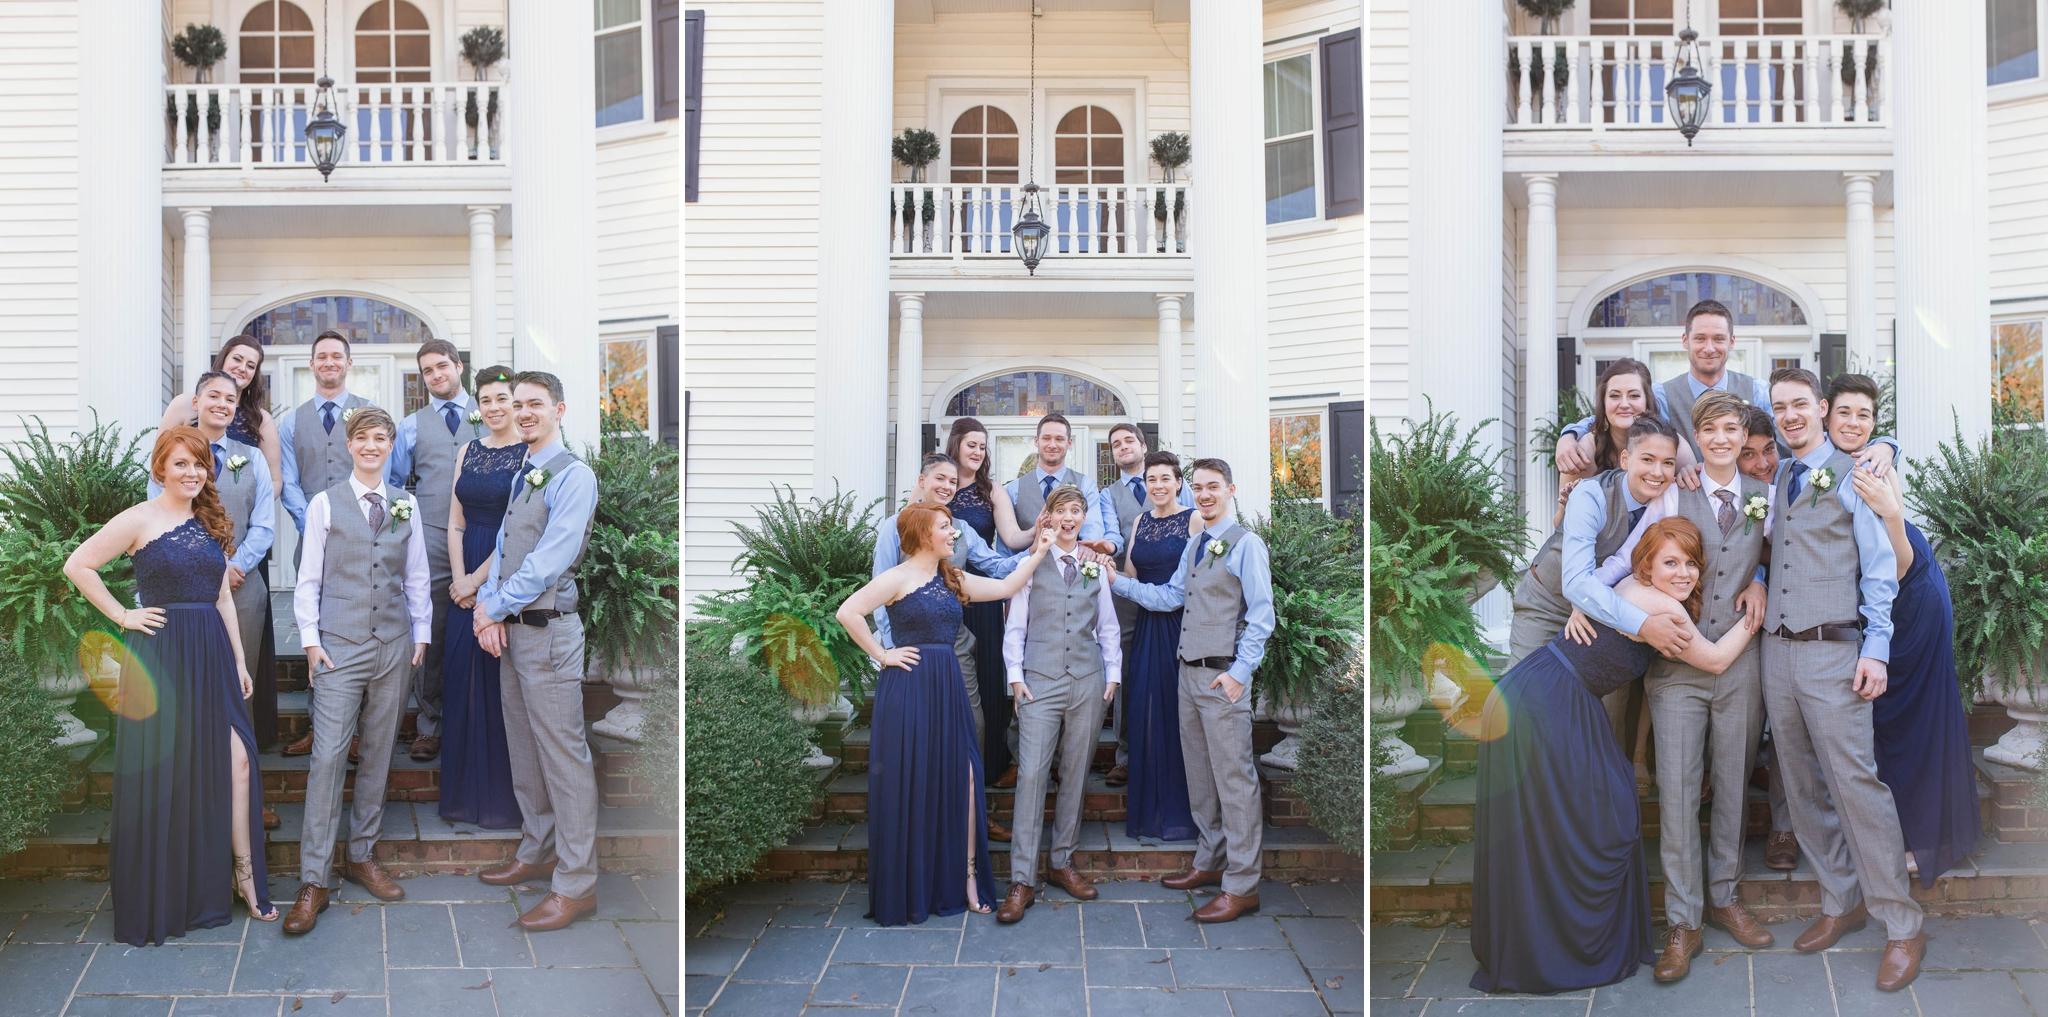 Lesbian Wedding in Cary North Carolina